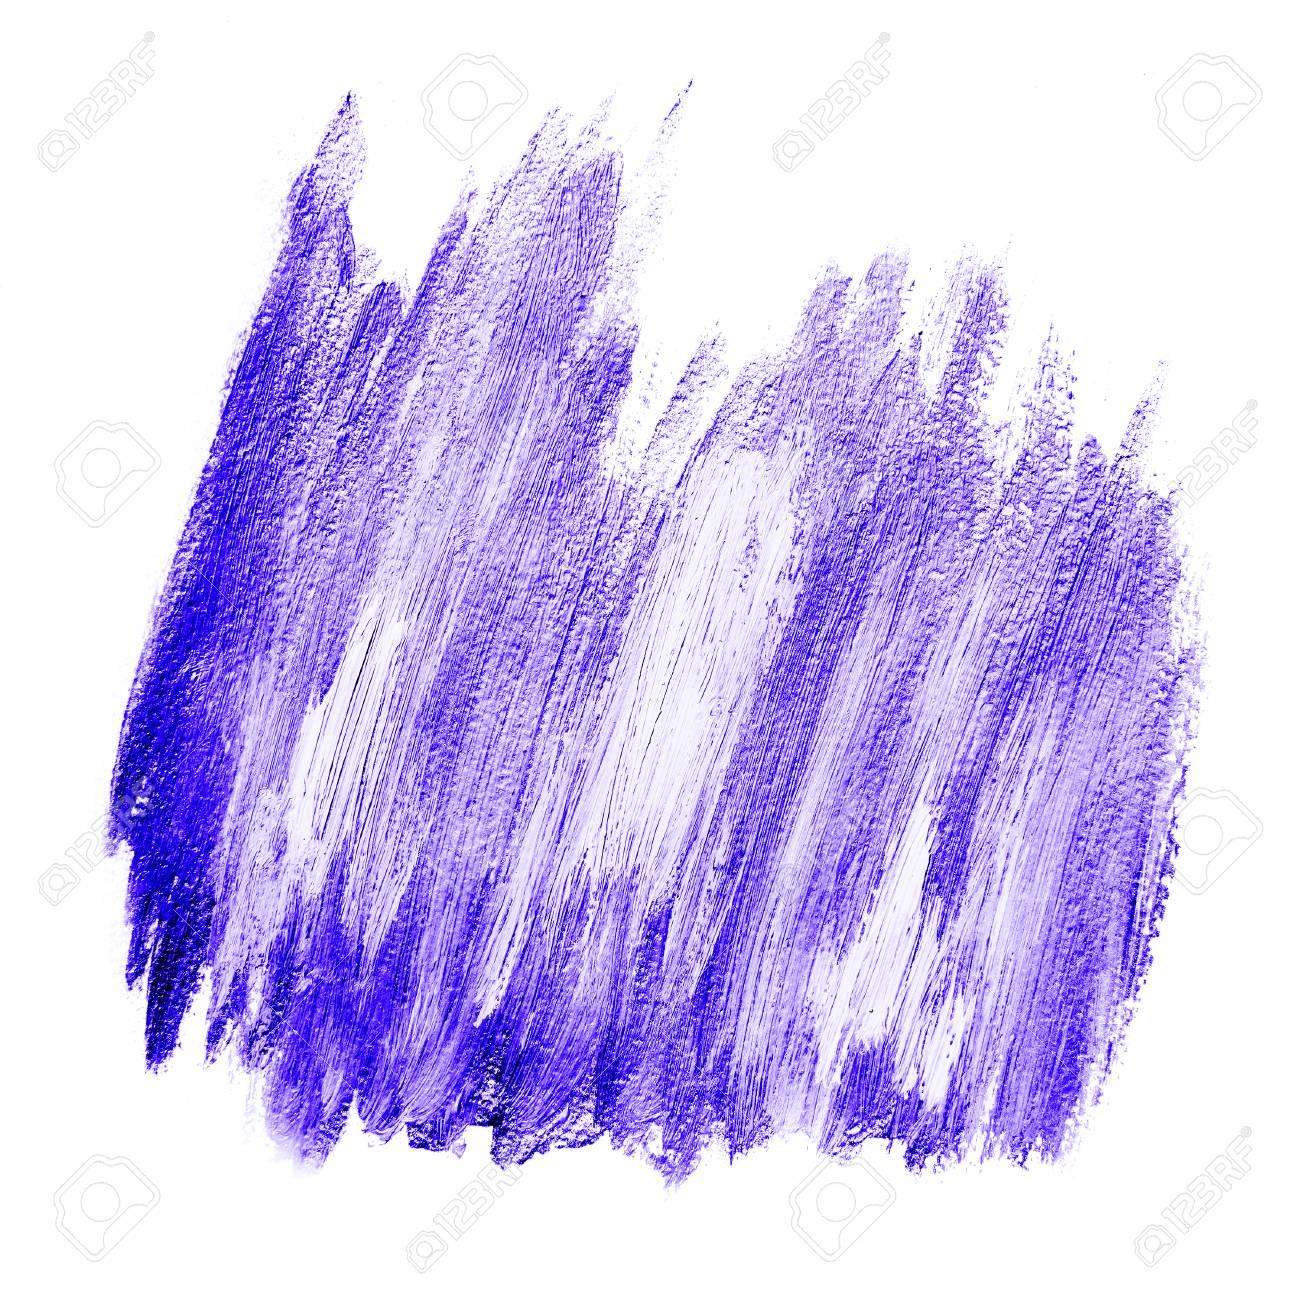 Purple white brushstrokes acrylic banner isolated on white background